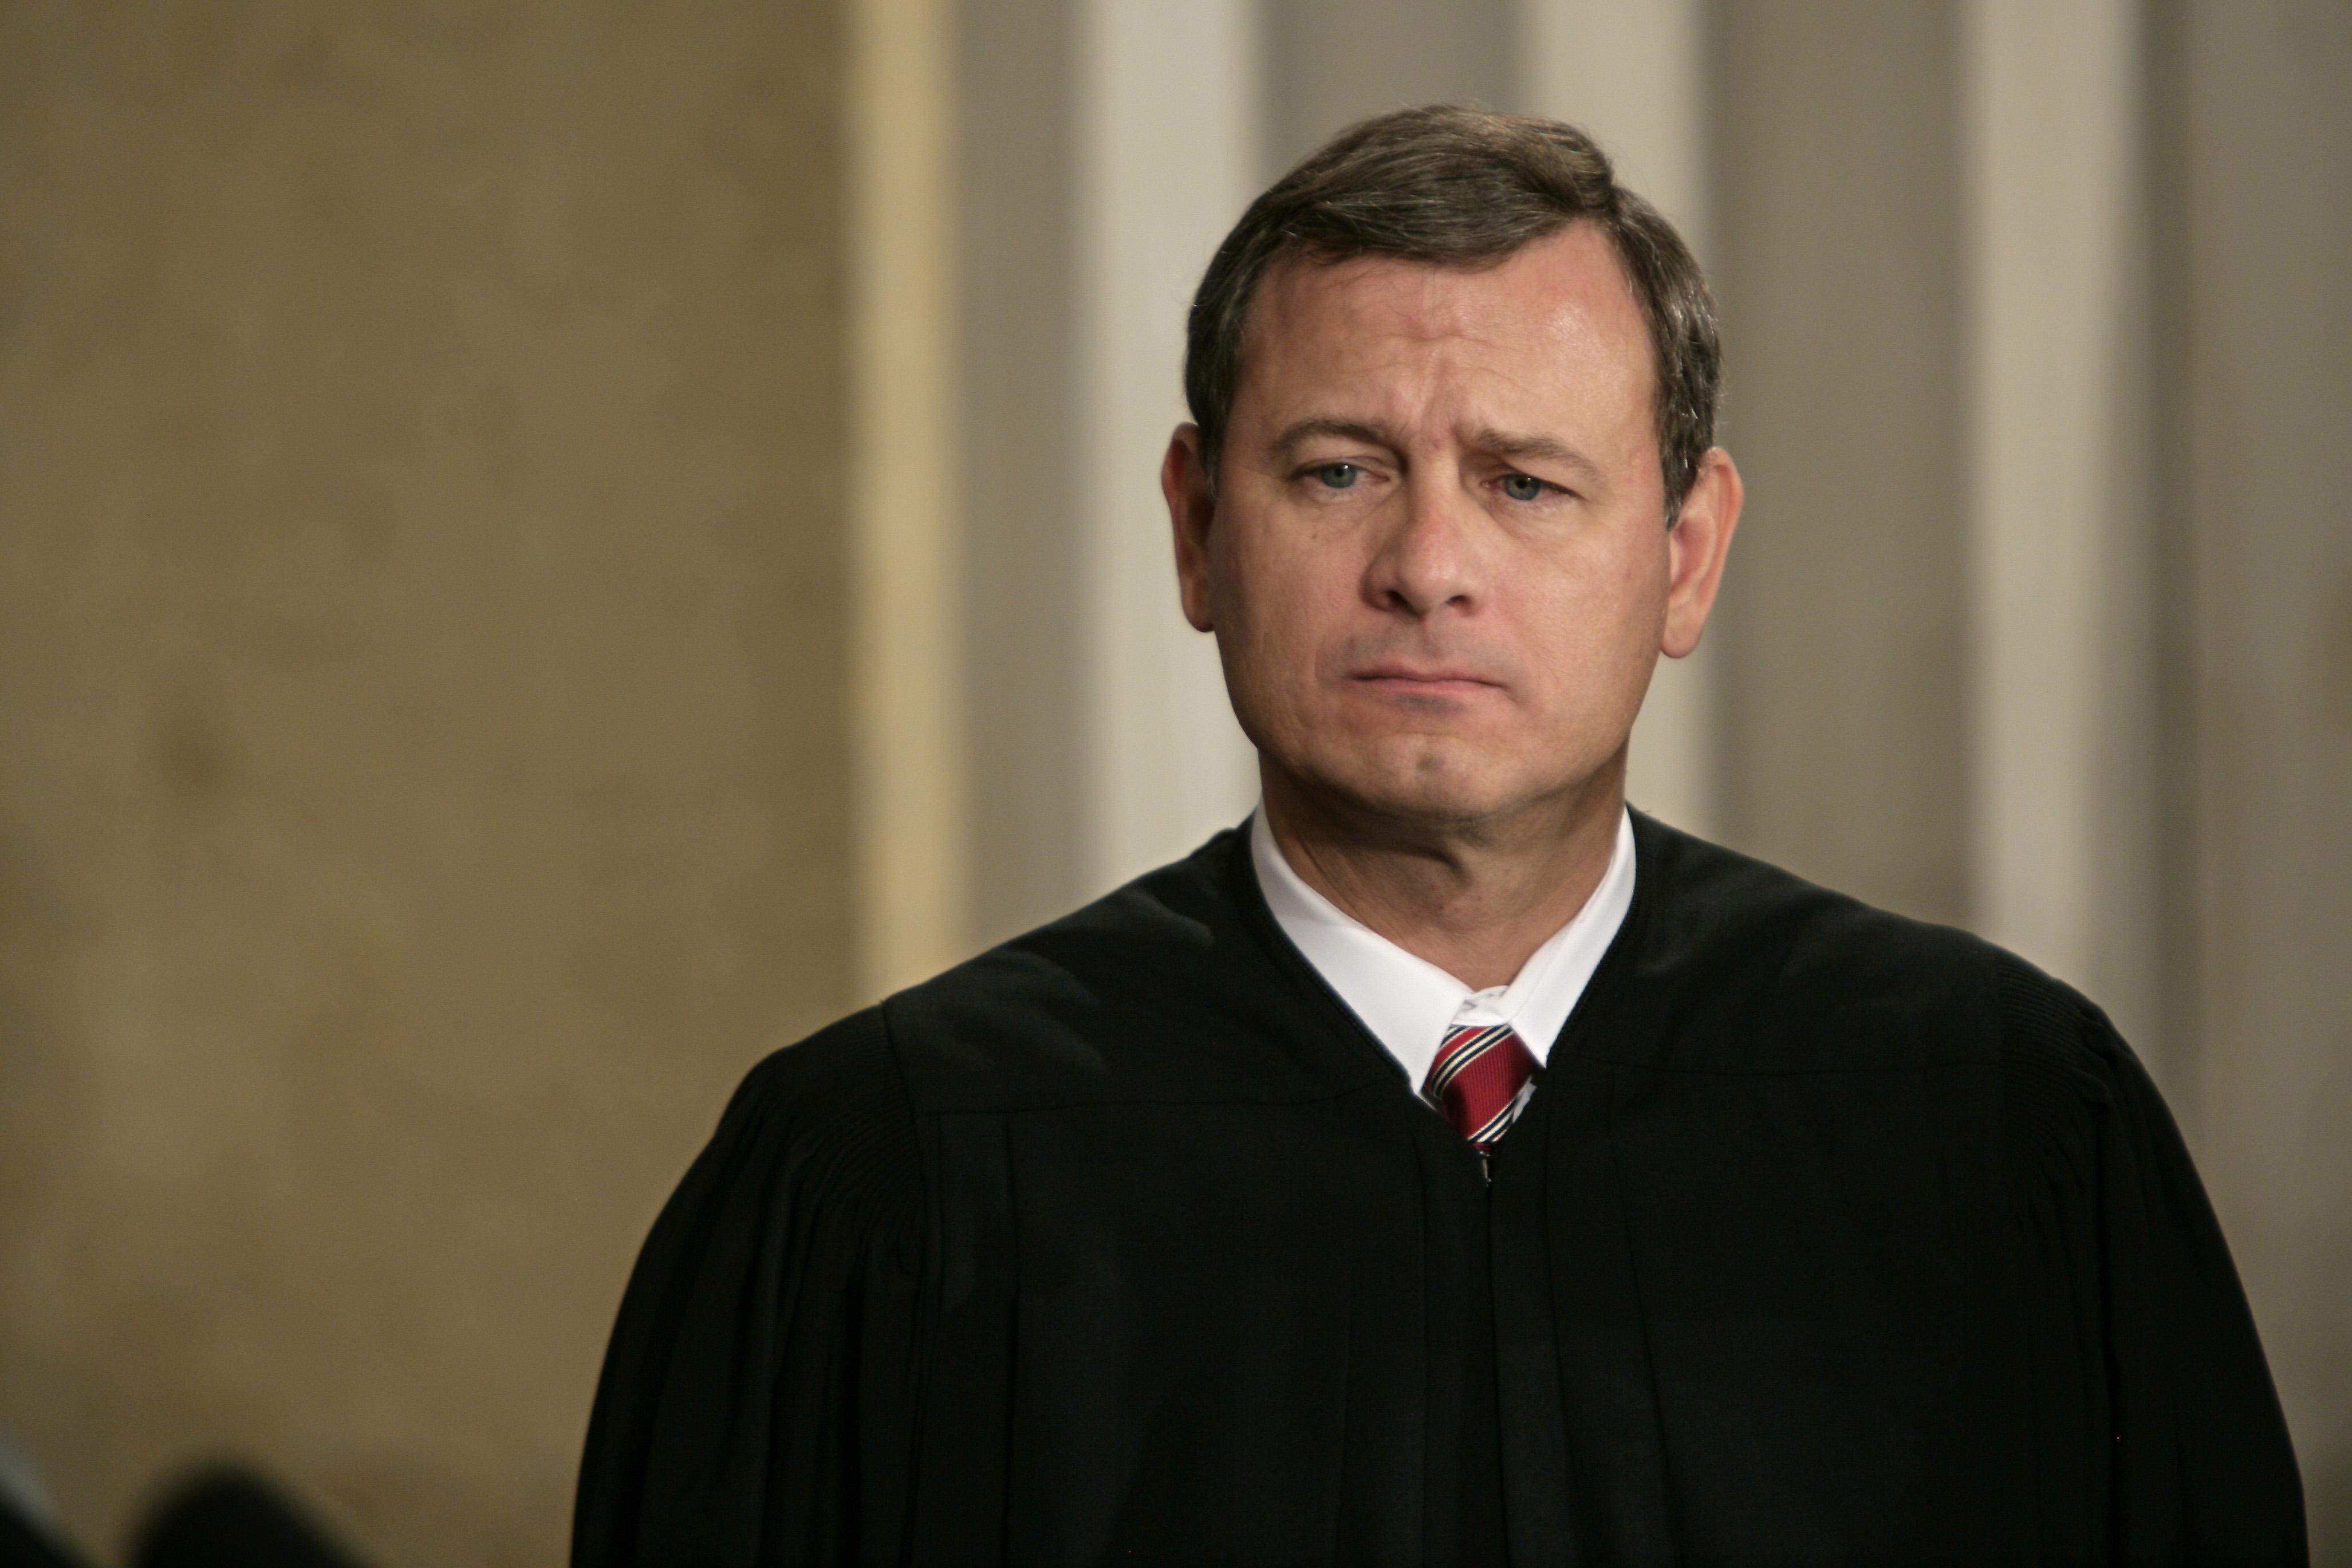 Roberts a Pivotal Vote in the Supreme Court's Big Opinions